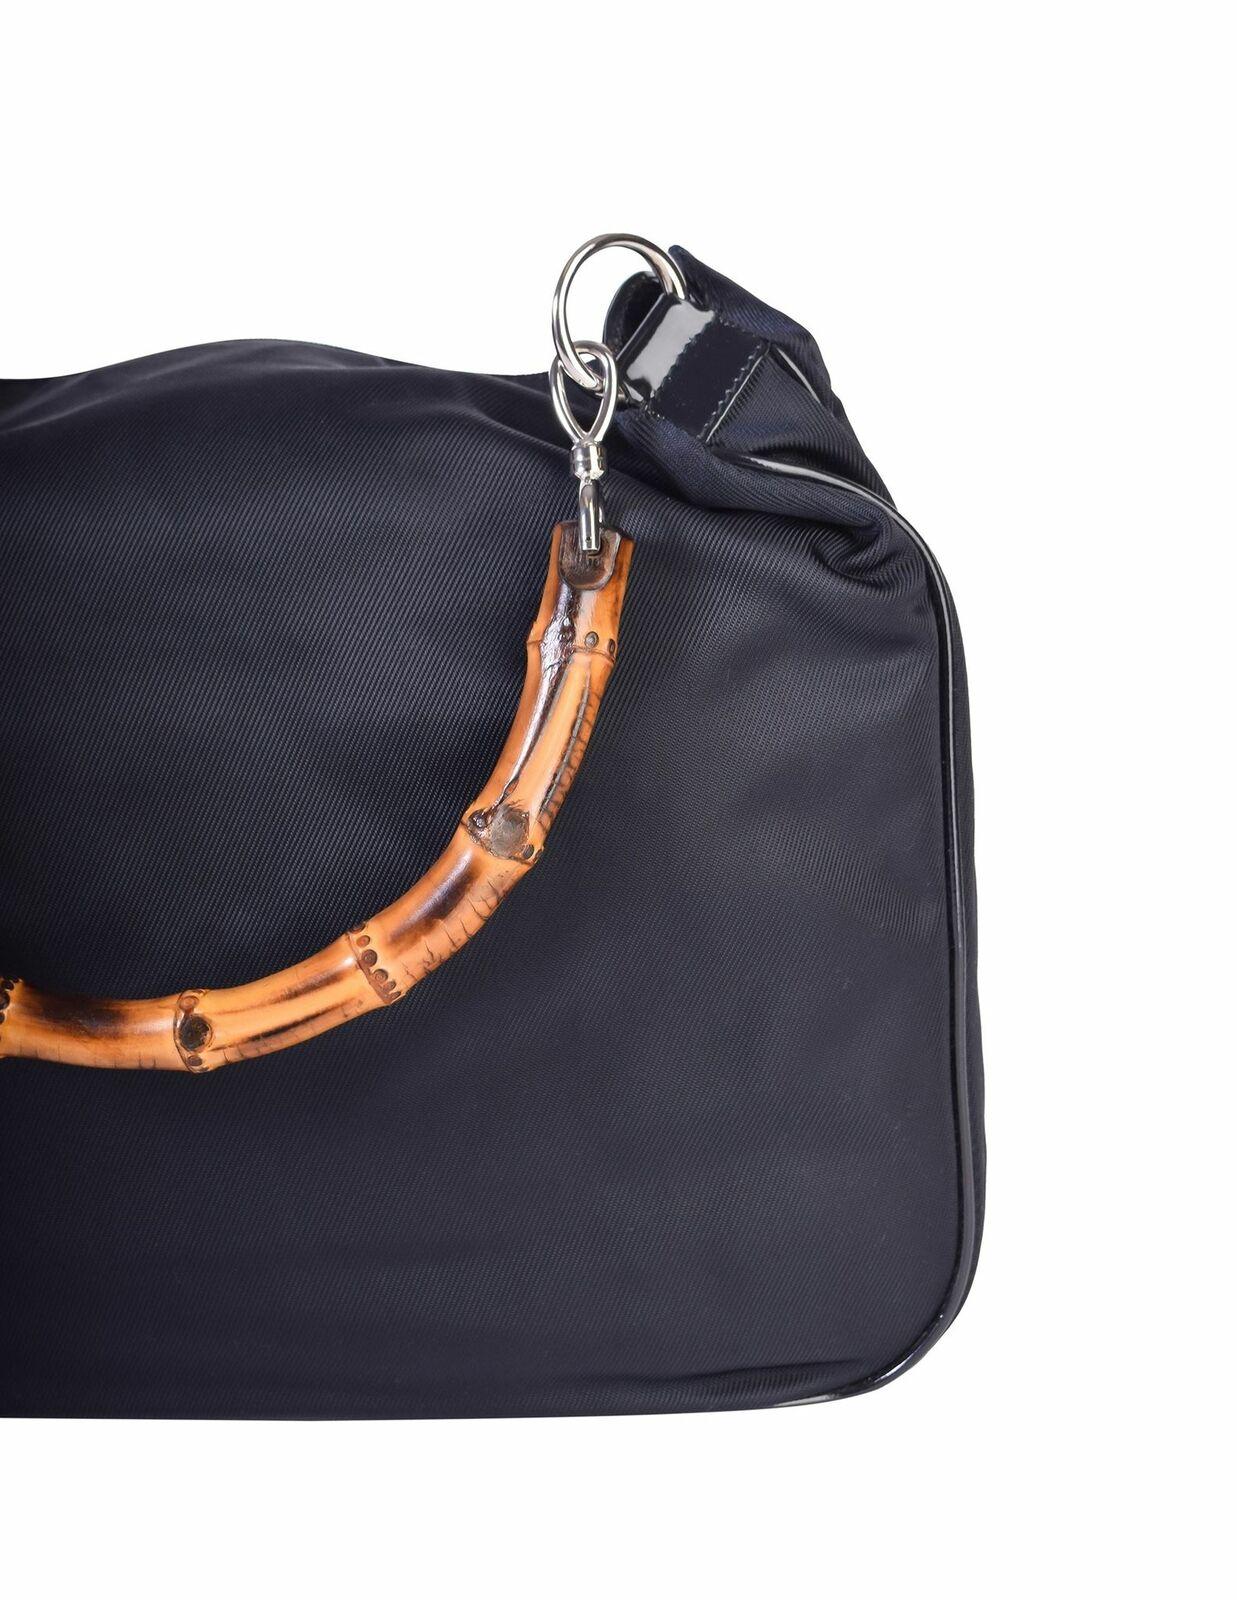 Gucci Vintage Large Navy Blue Nylon Patent Leathe… - image 7